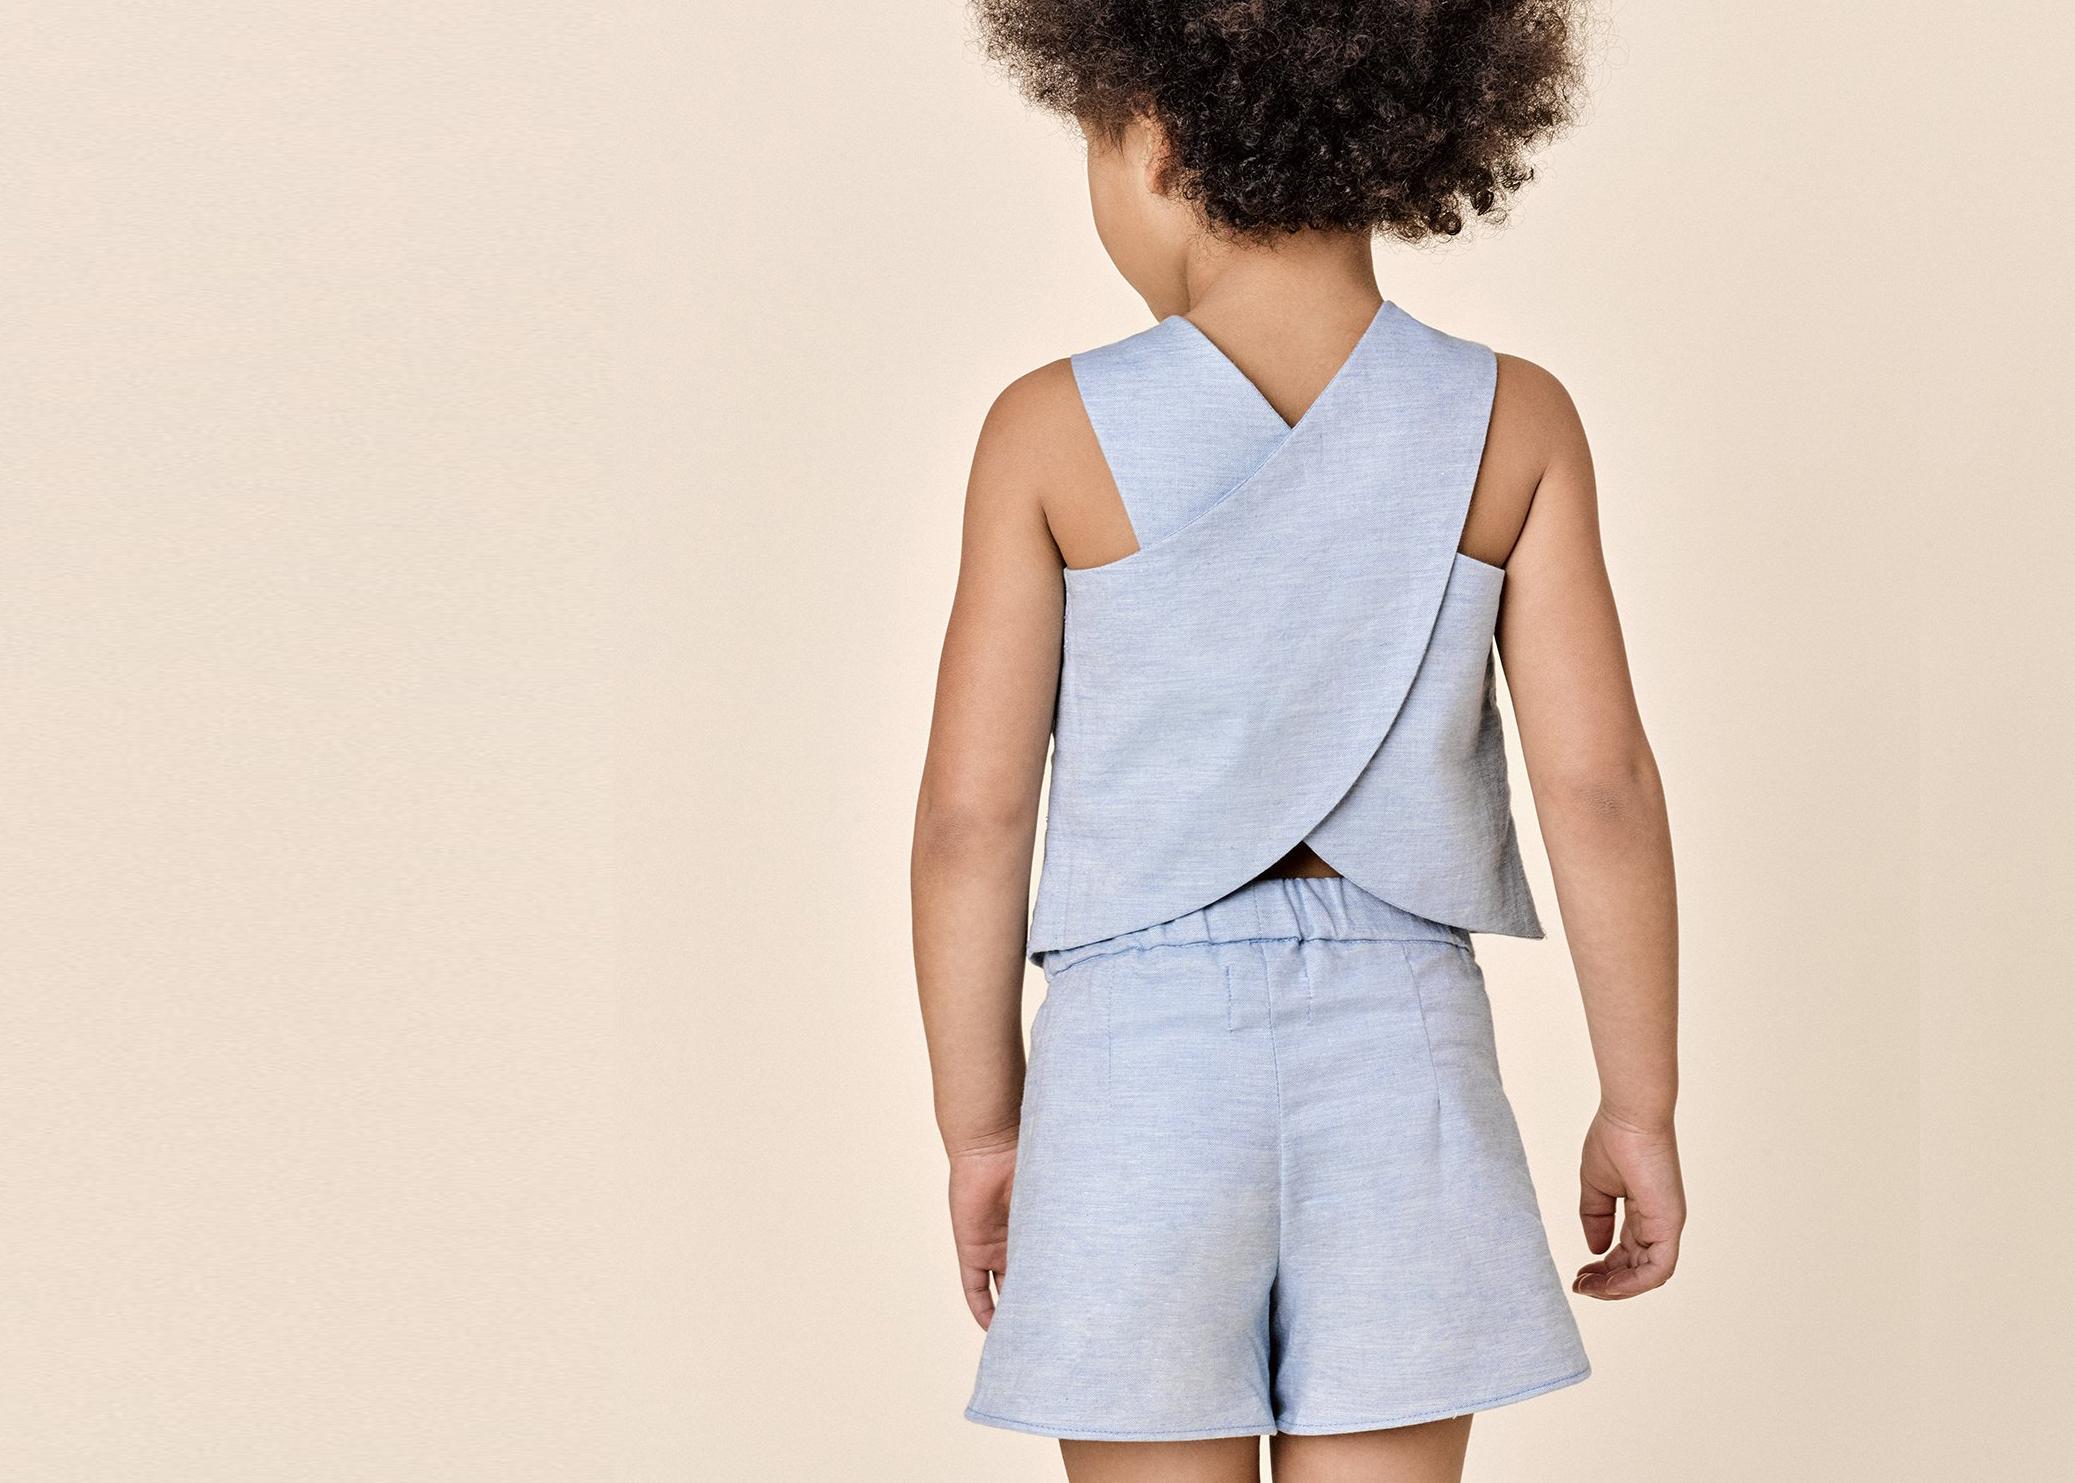 Beru Kids Bridget Apron Back Blouse and Short Set, $22